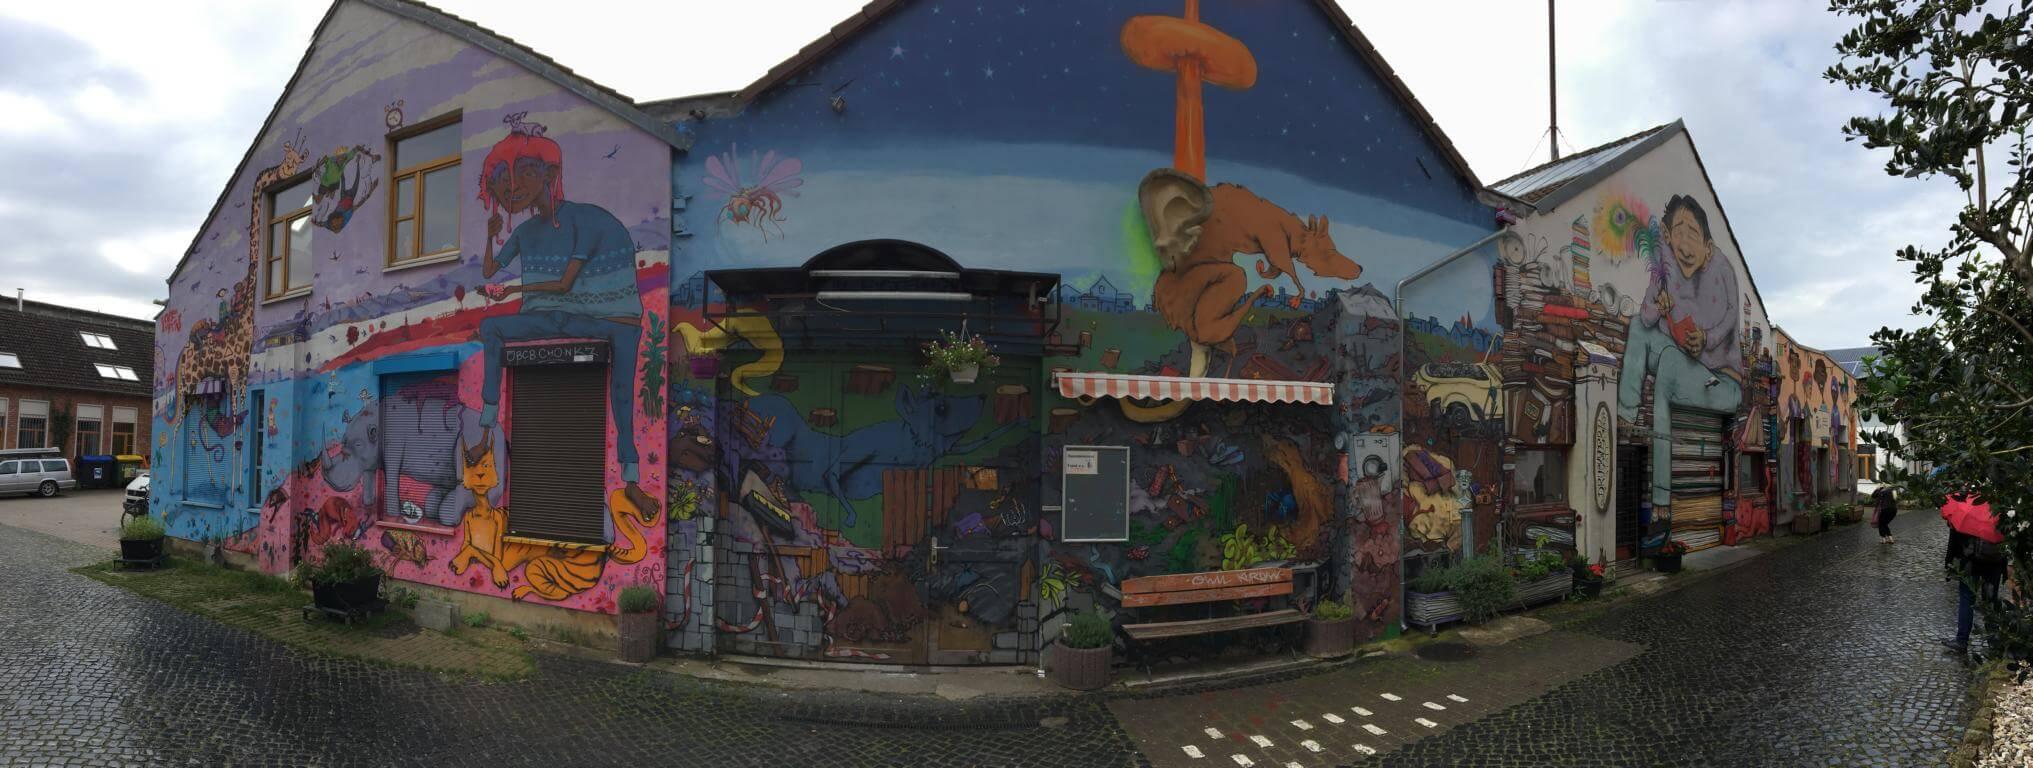 Hannover Linden Streetart Bettfedernfabrik